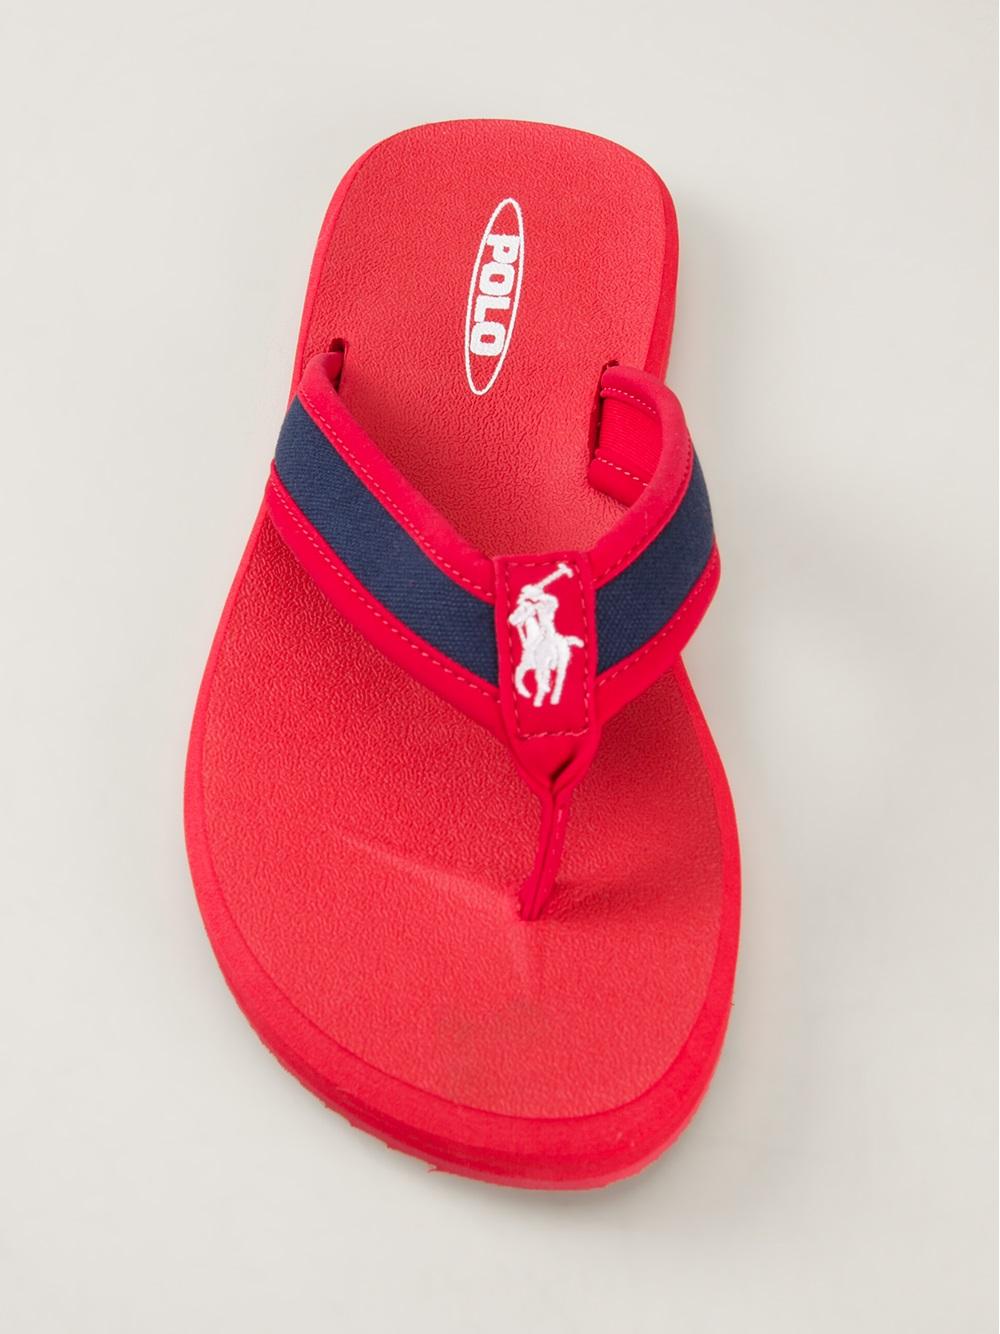 b63134621ed2a polo ralph lauren hat pink ralf lauren polo shoes men